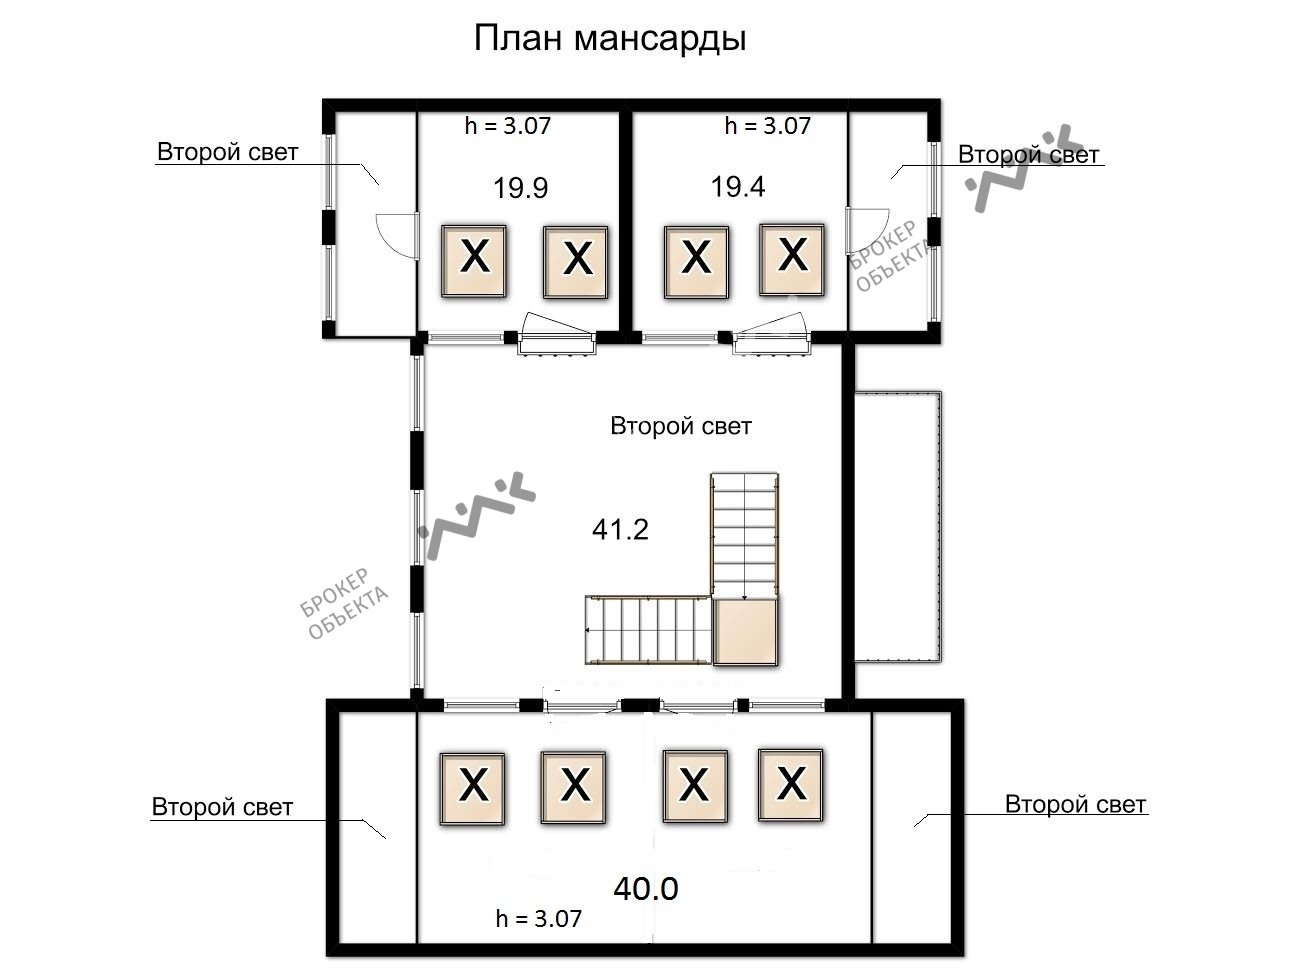 Планировка Лахтинский проспект, д.119, лит.А. Лот № 1550415